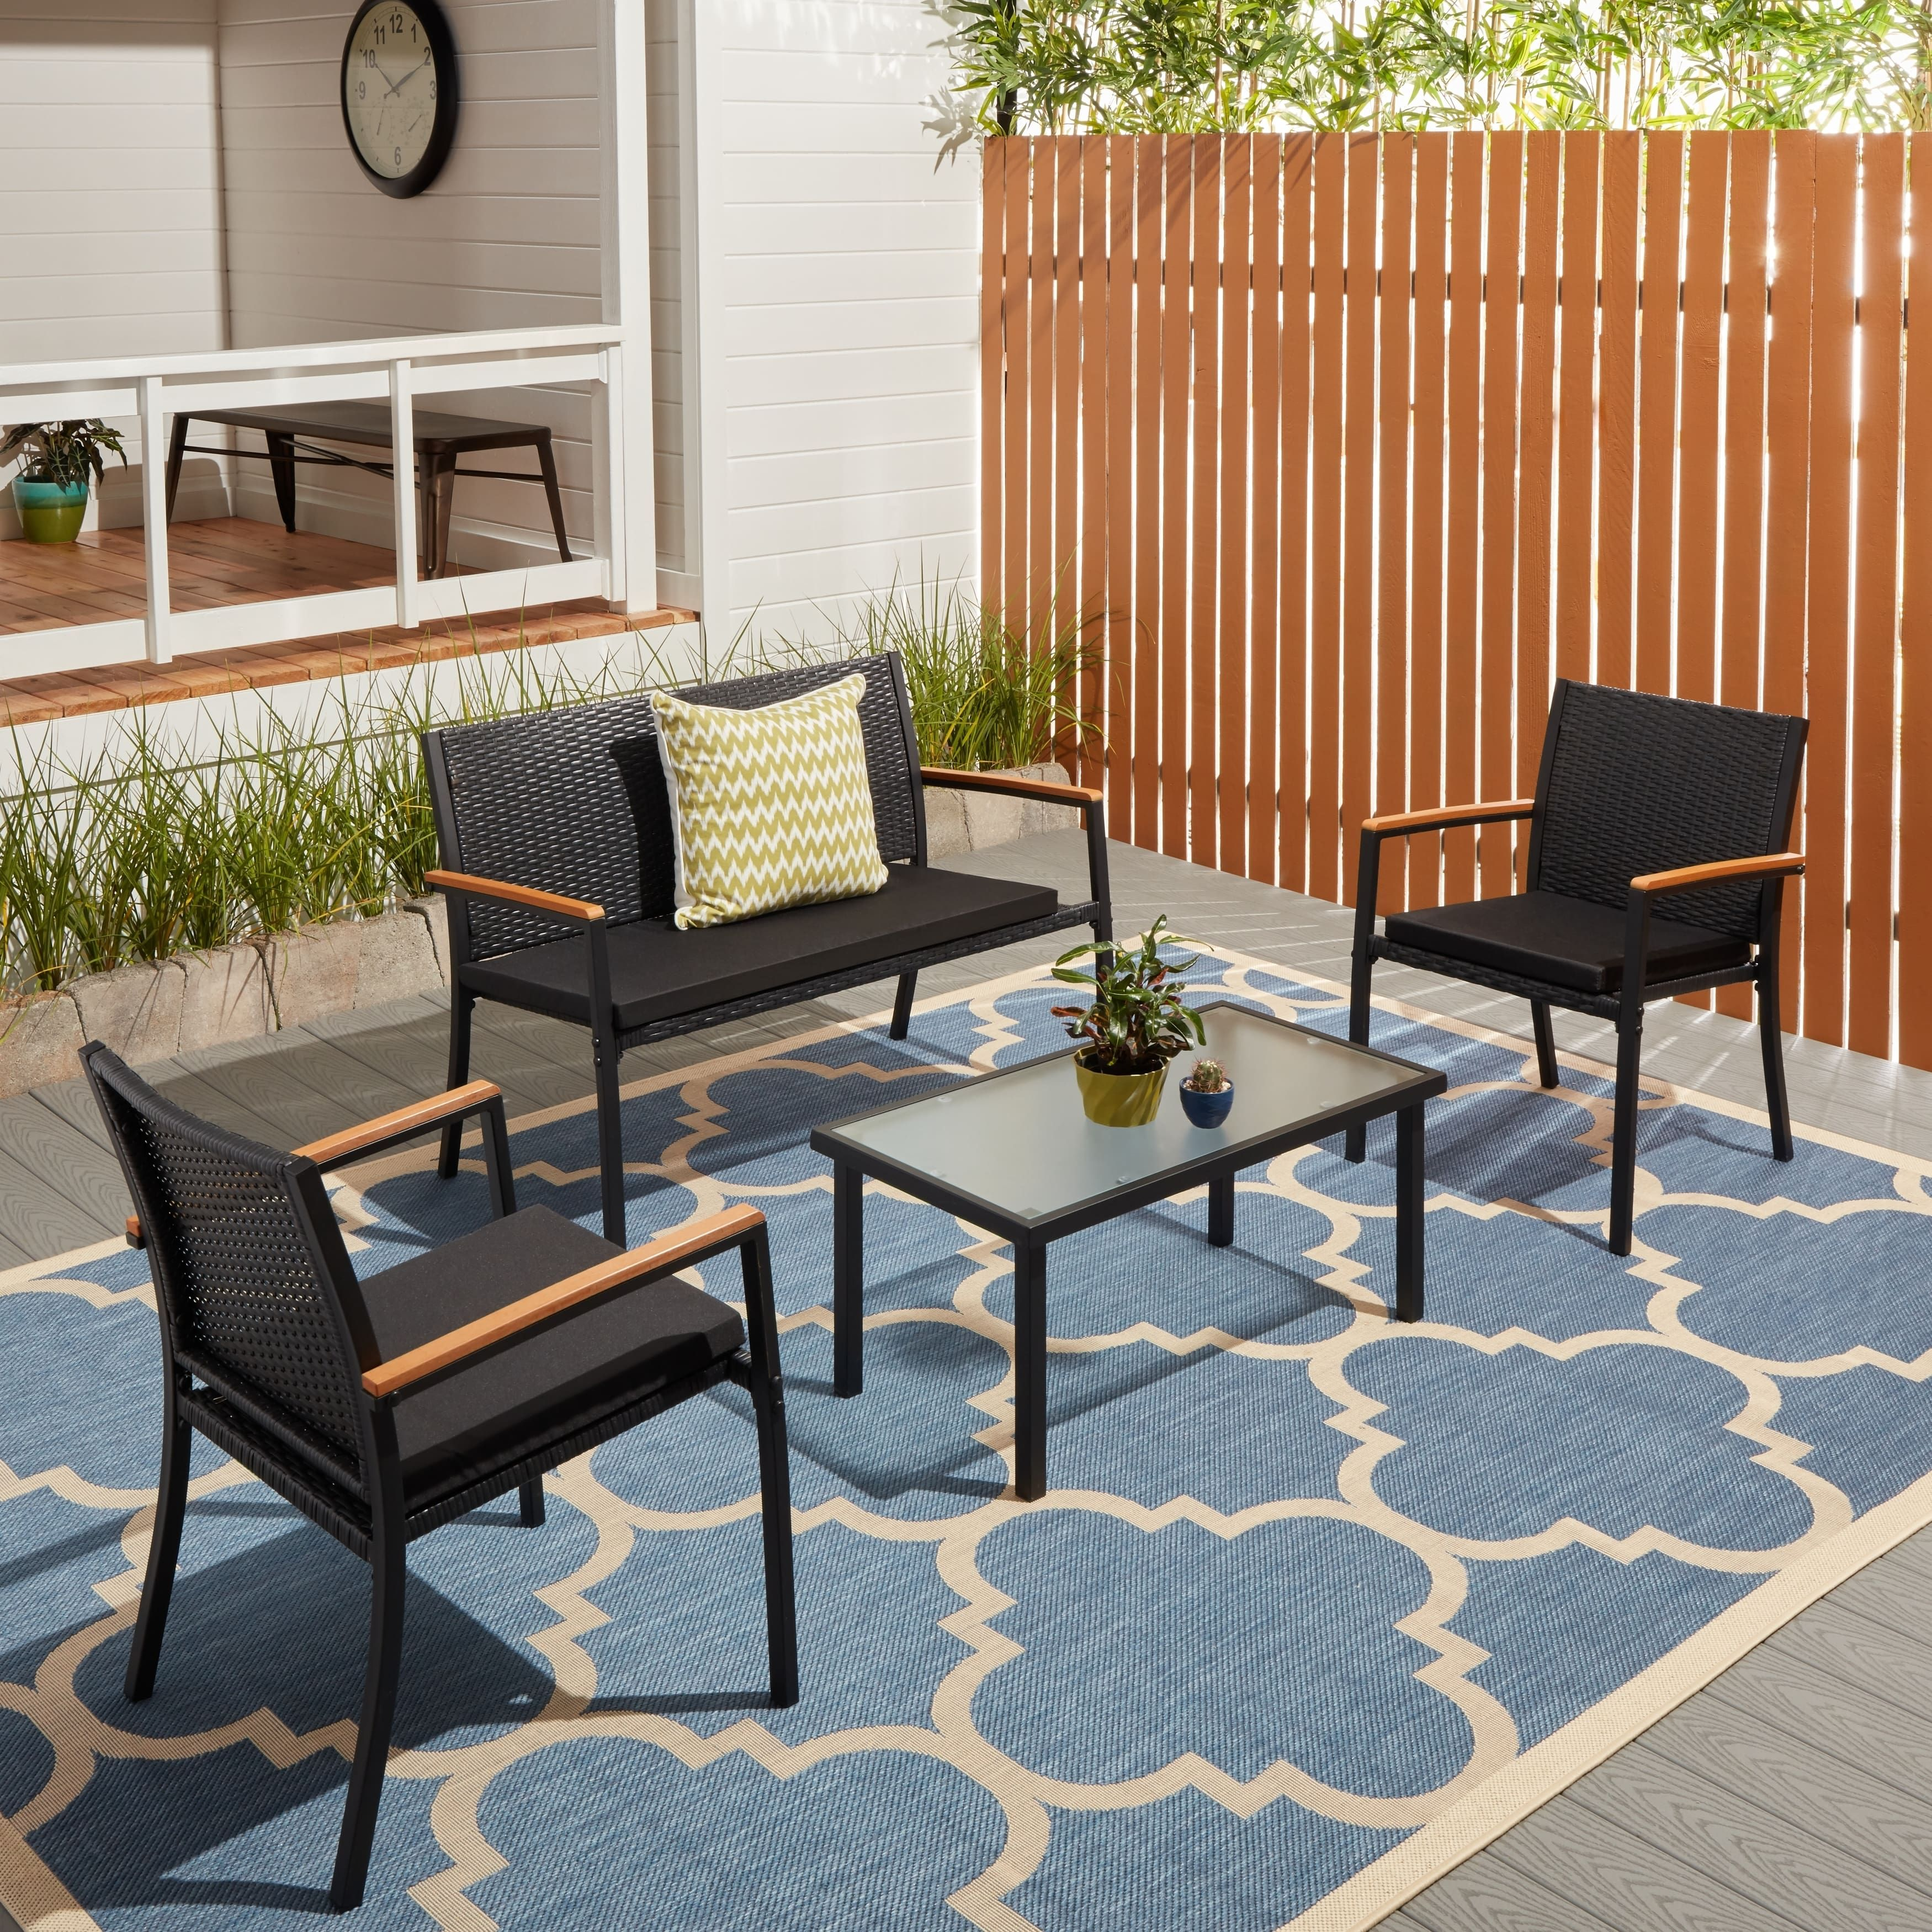 Corvus Lecco Black Wicker Outdoor 4 piece Seating Set